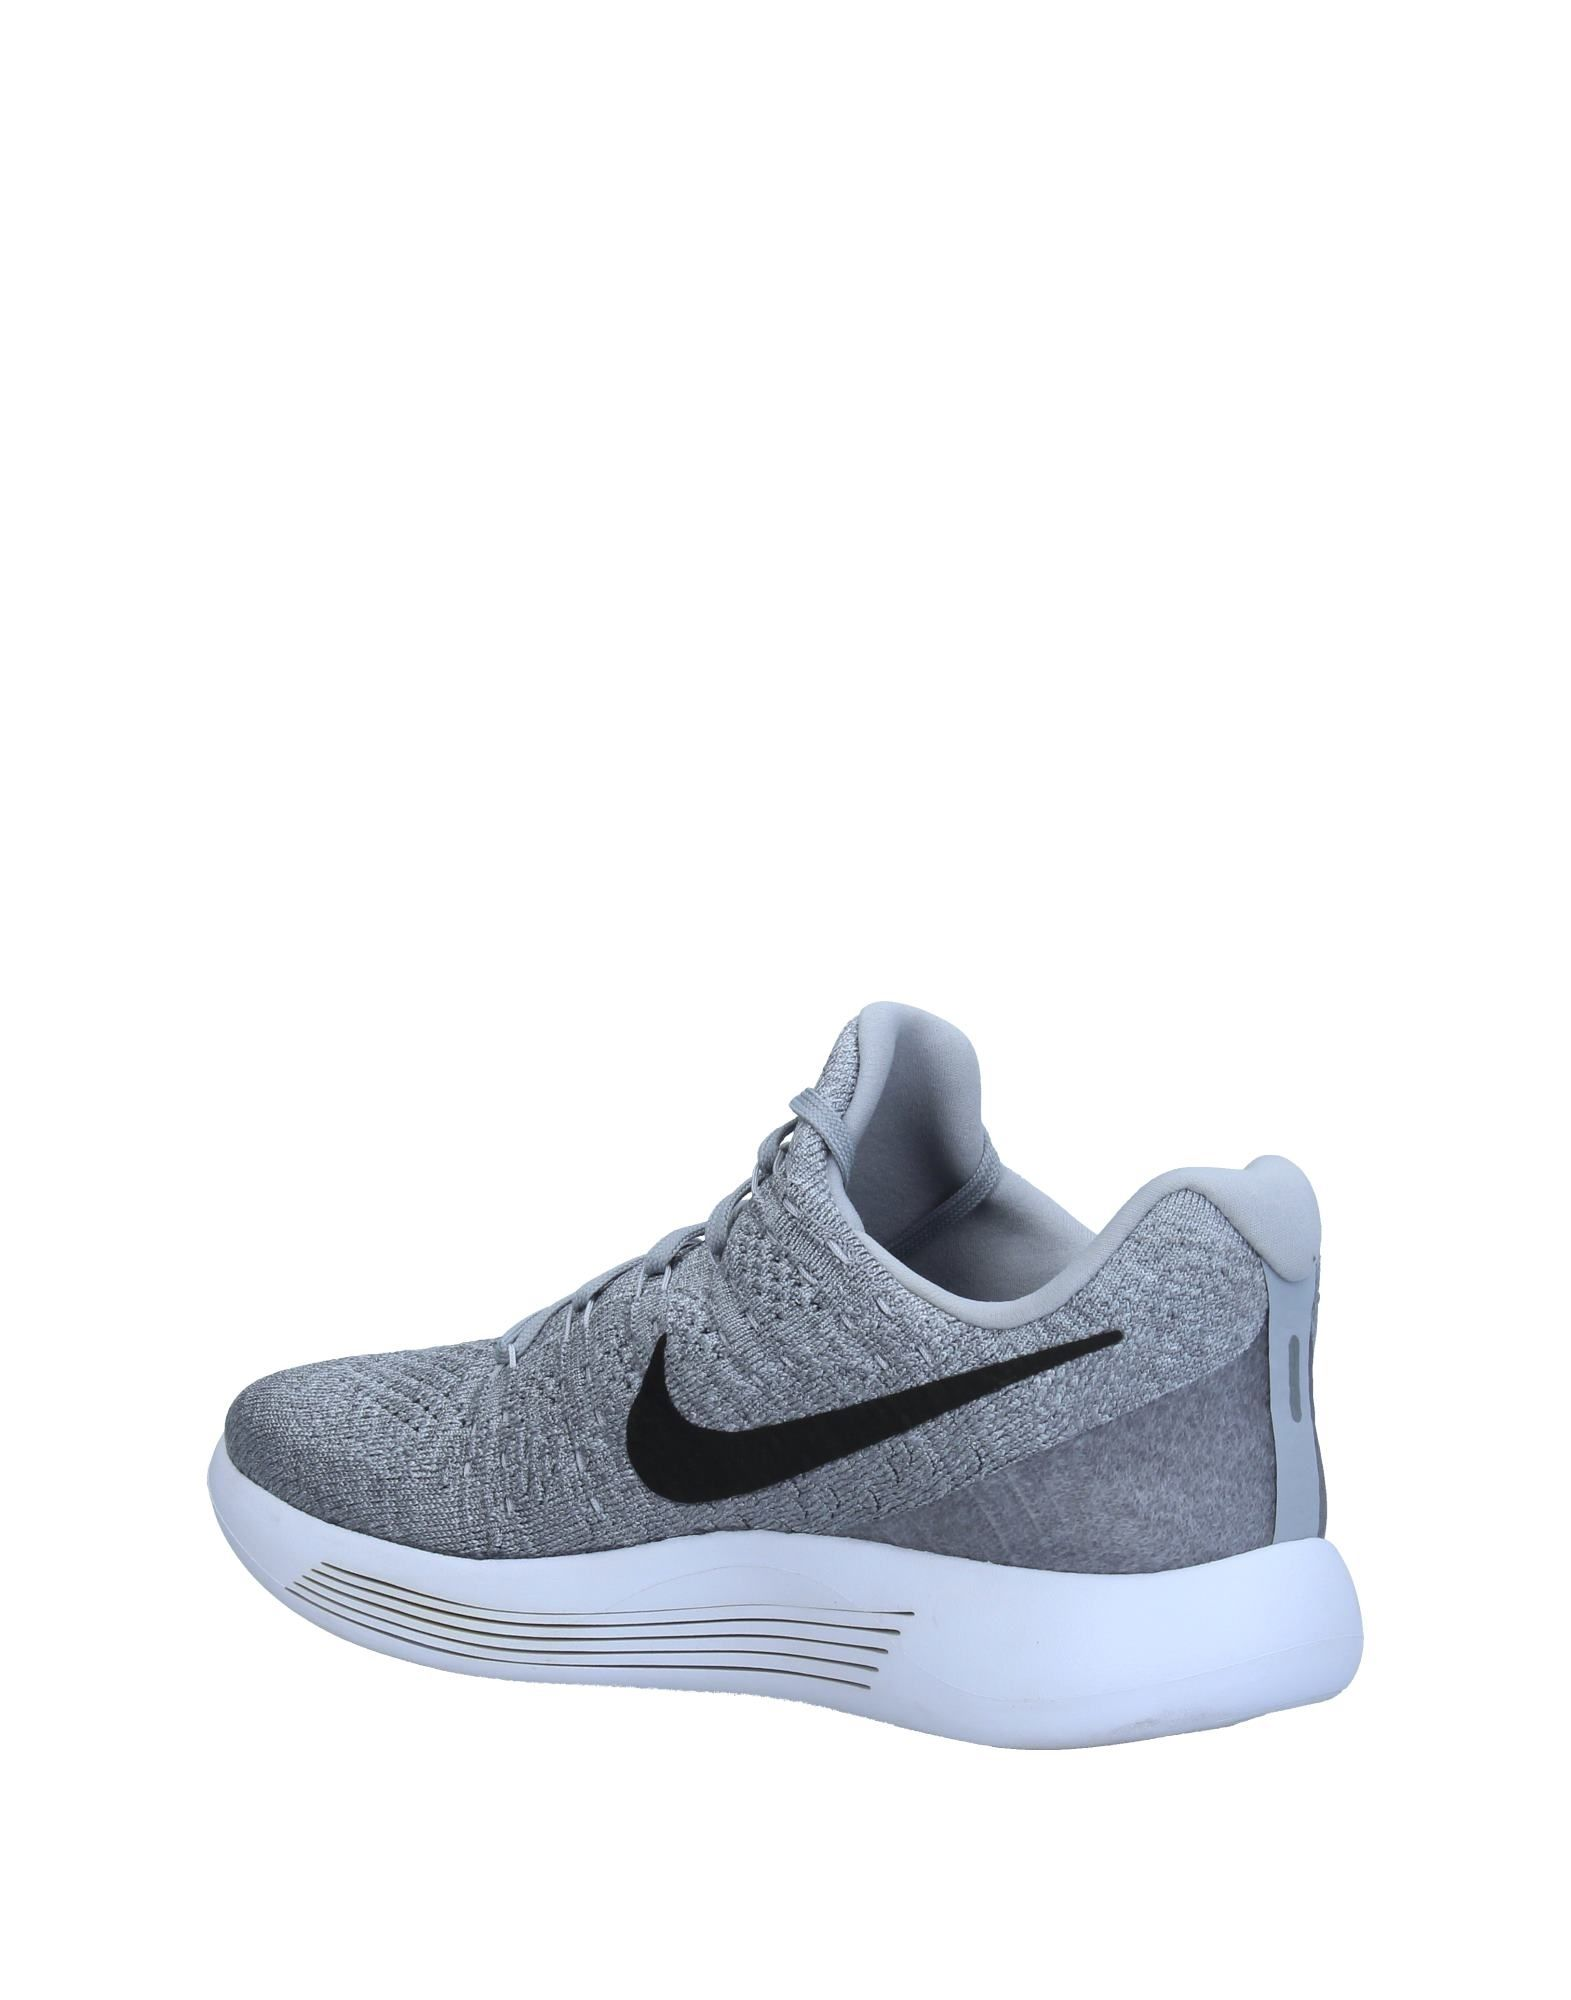 11357751BI Nike Sneakers Herren  11357751BI  34ed8a